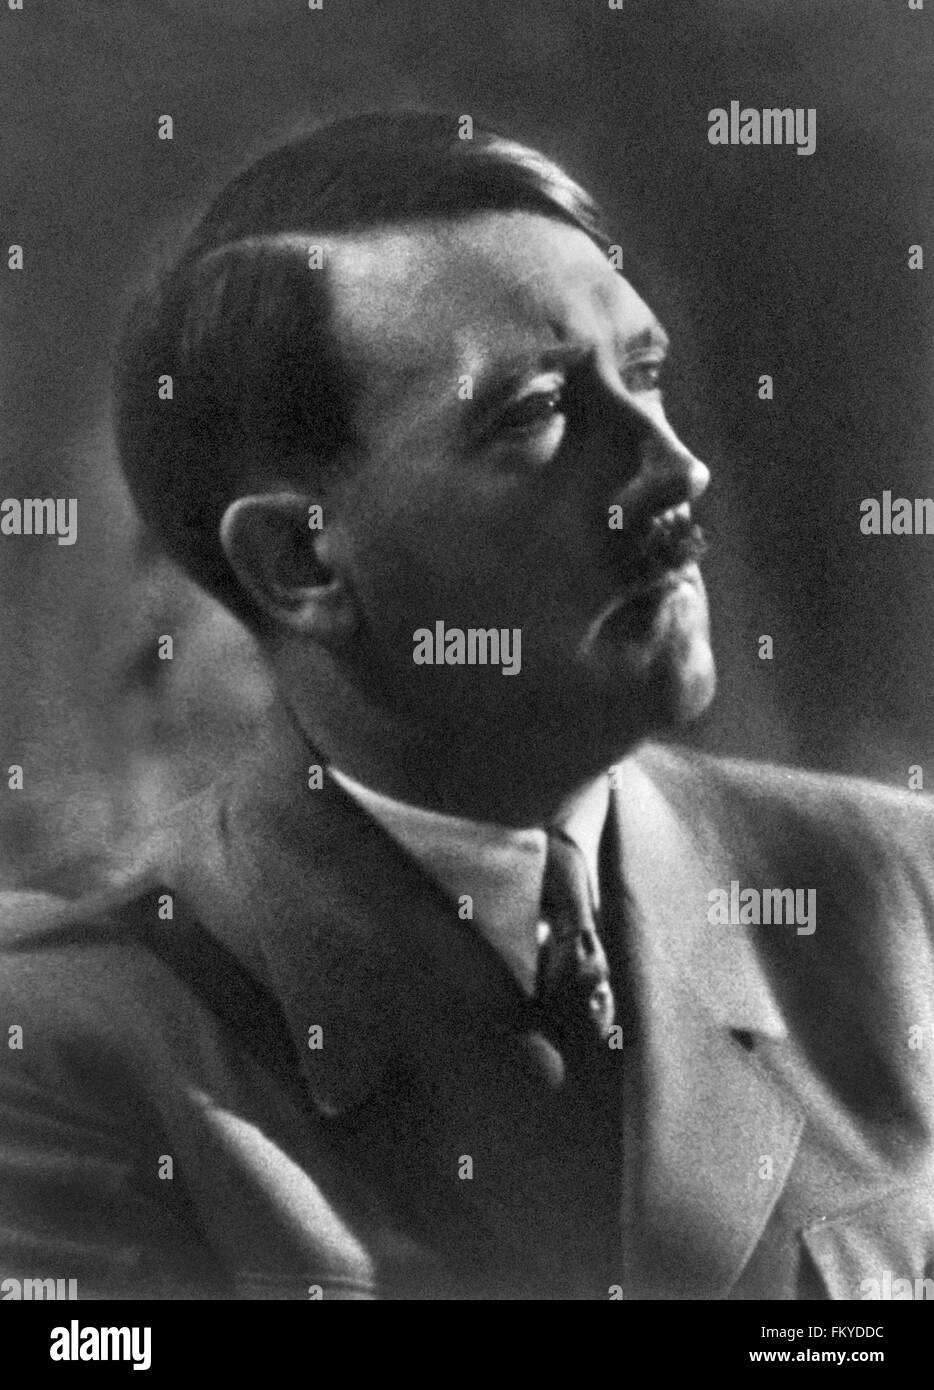 Adolf Hitler Portrait - Stock Image